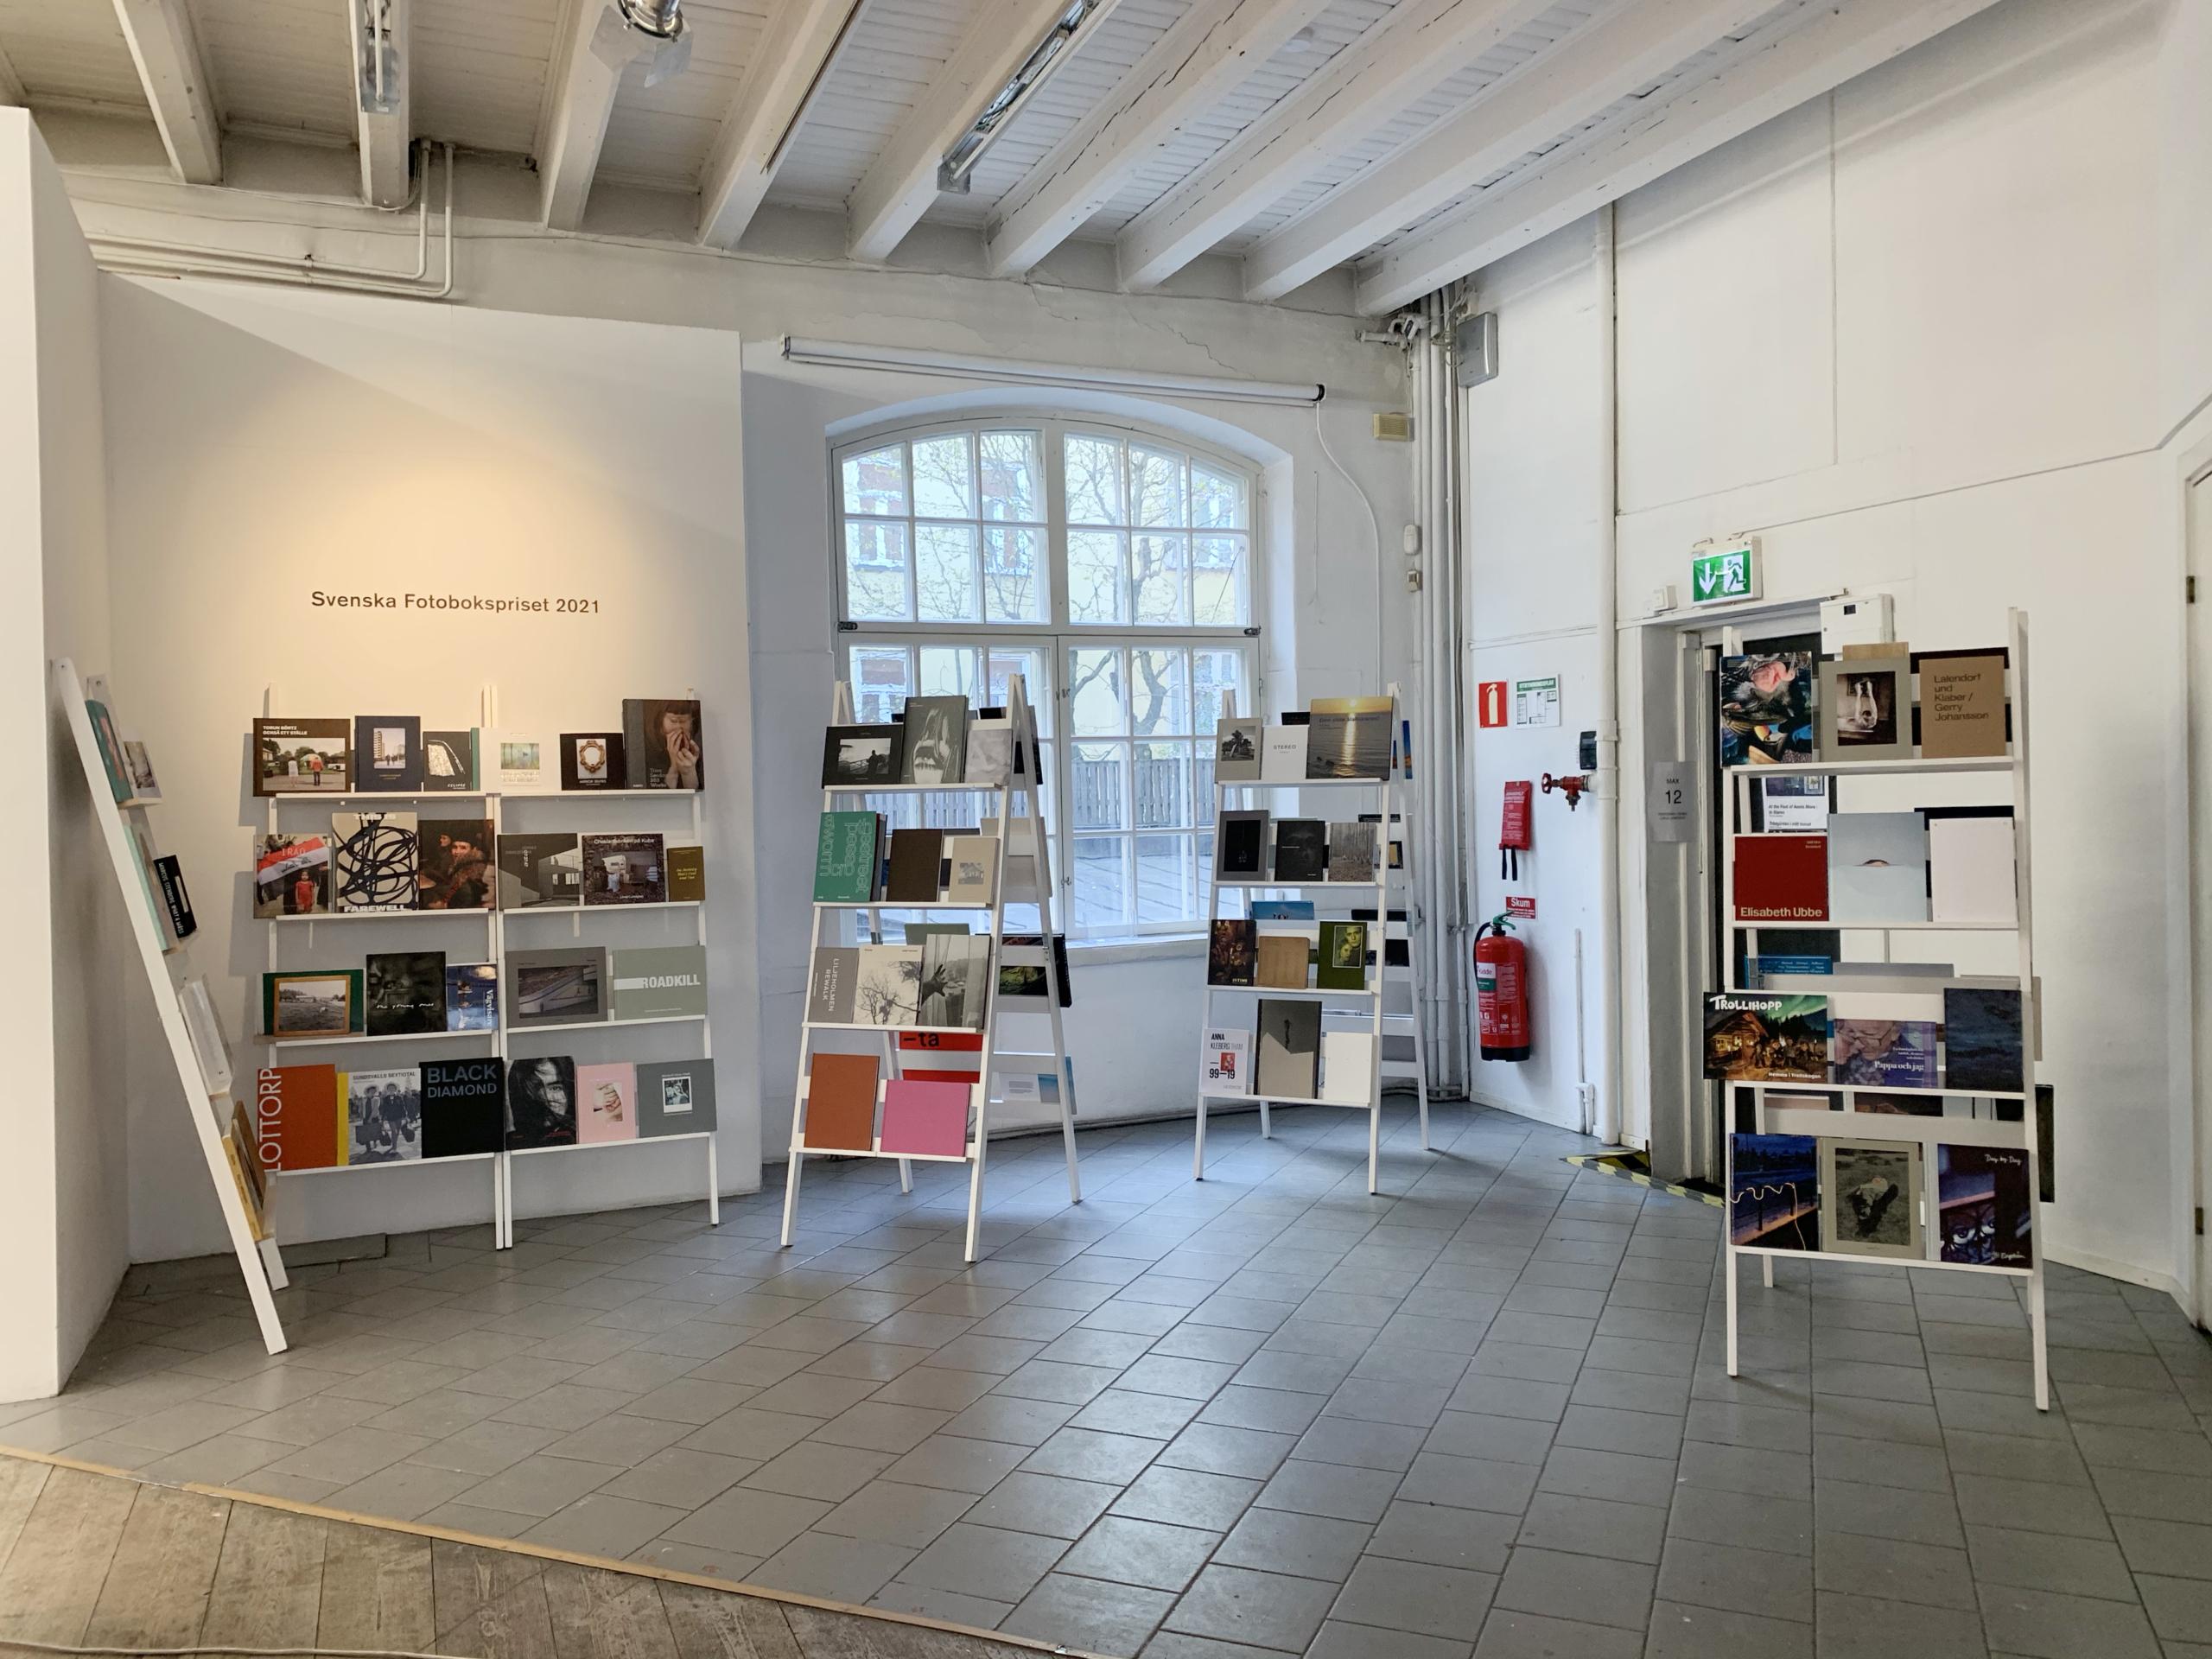 Svenska Fotobokspriset 2021 på turné